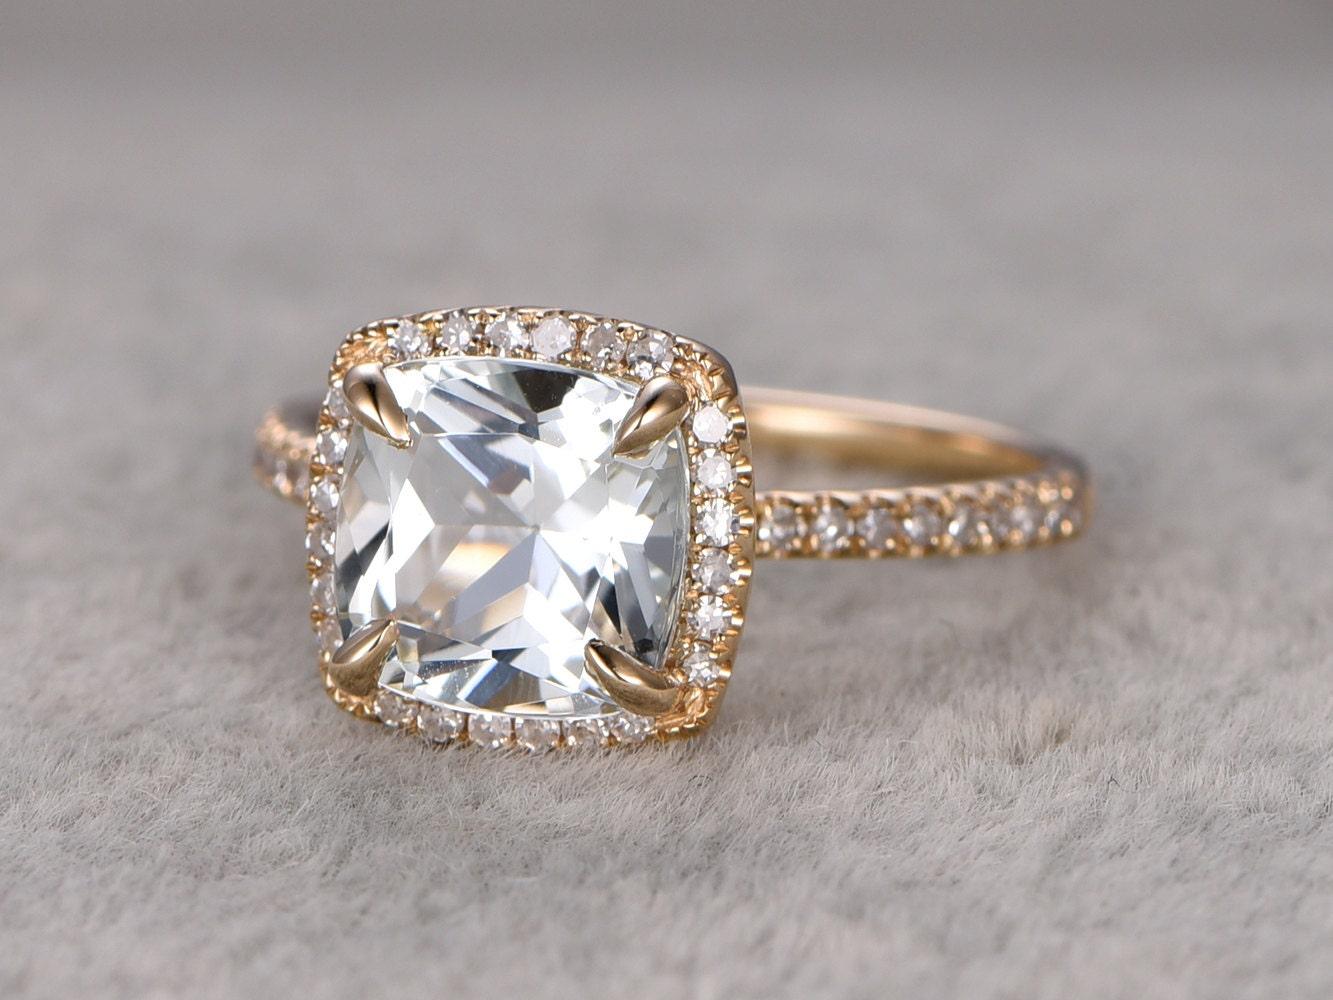 2 6ct white topaz engagement ringdiamond wedding ring14k